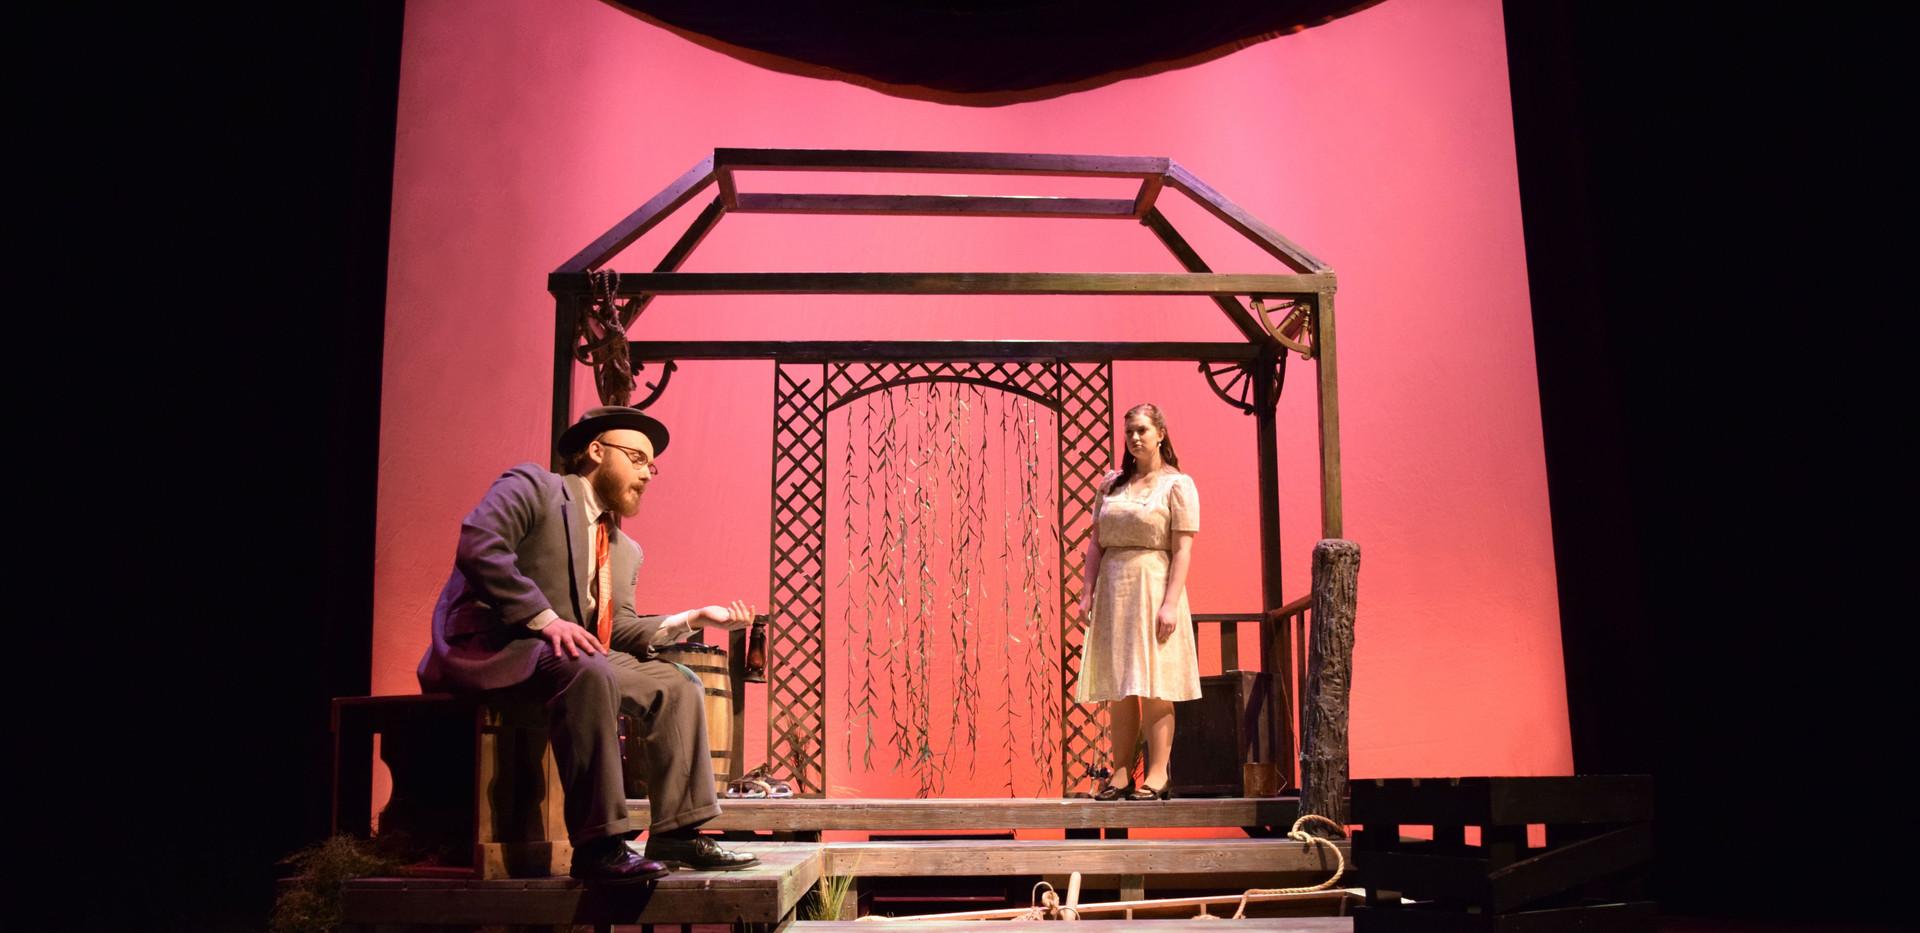 pink meg and john.jpg